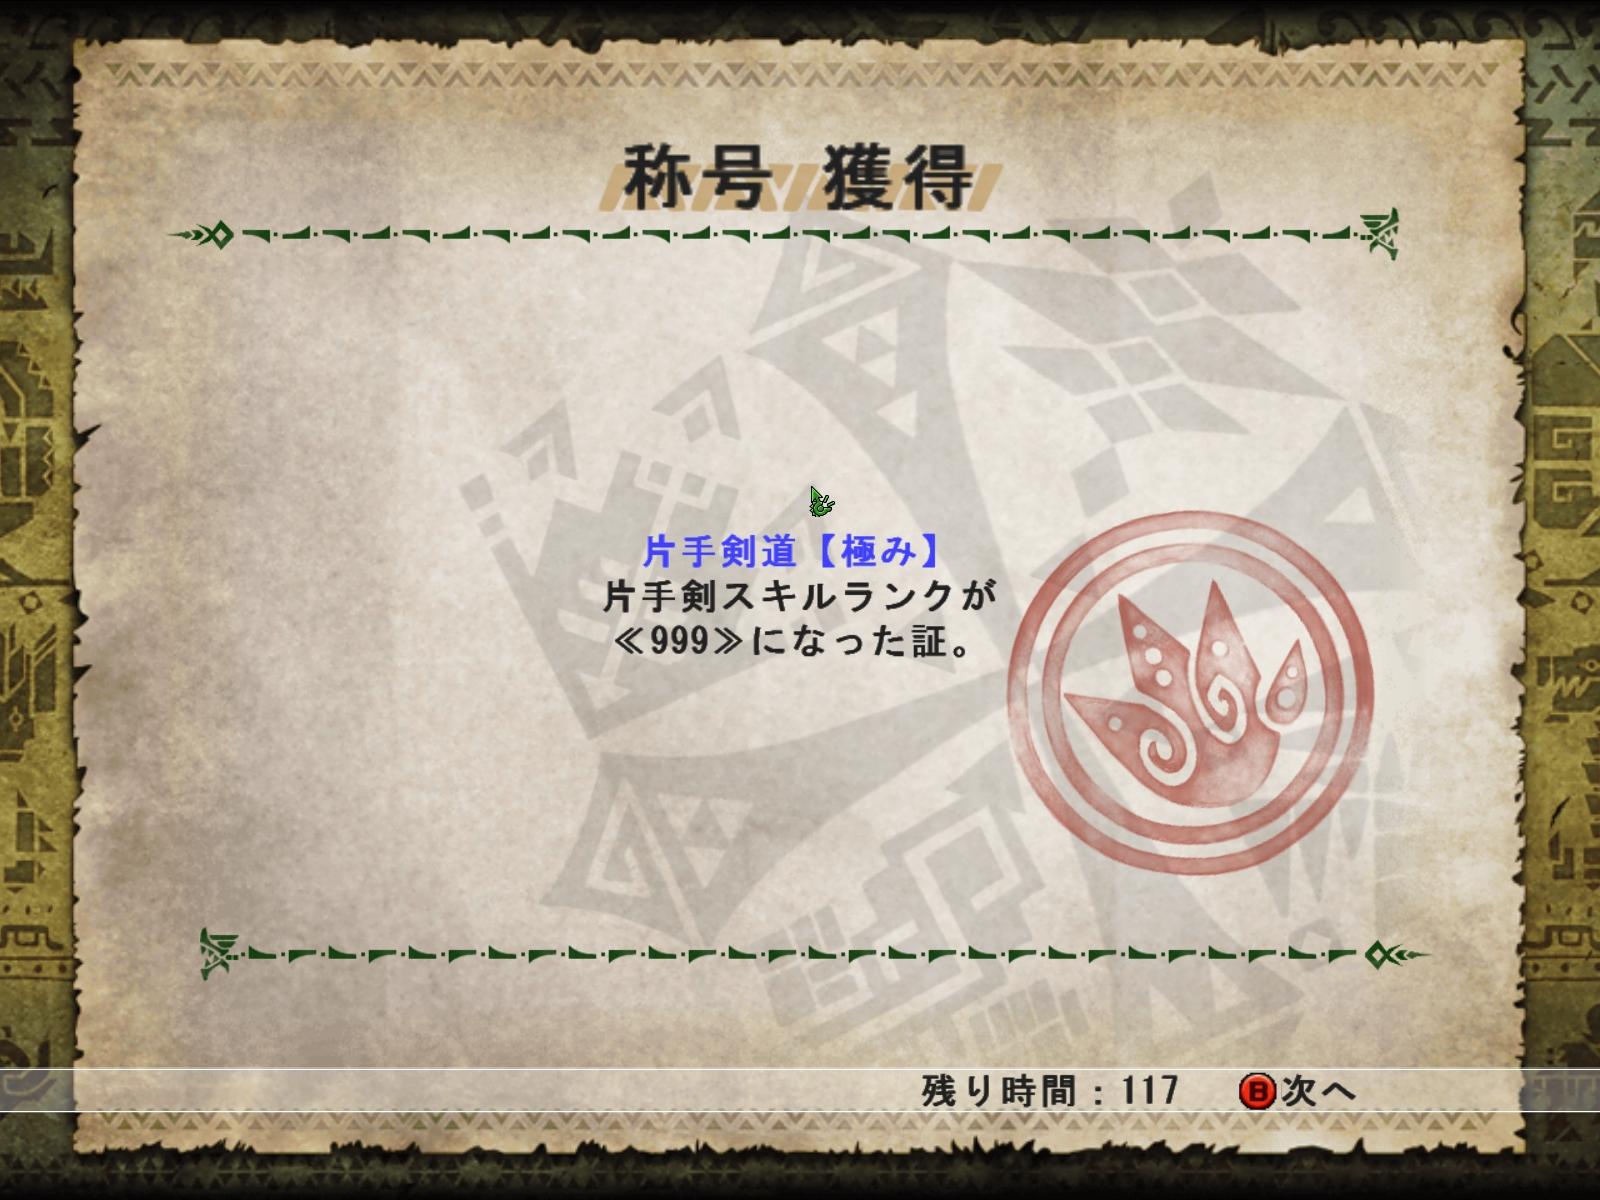 mhf_20131221_133130_295.jpg